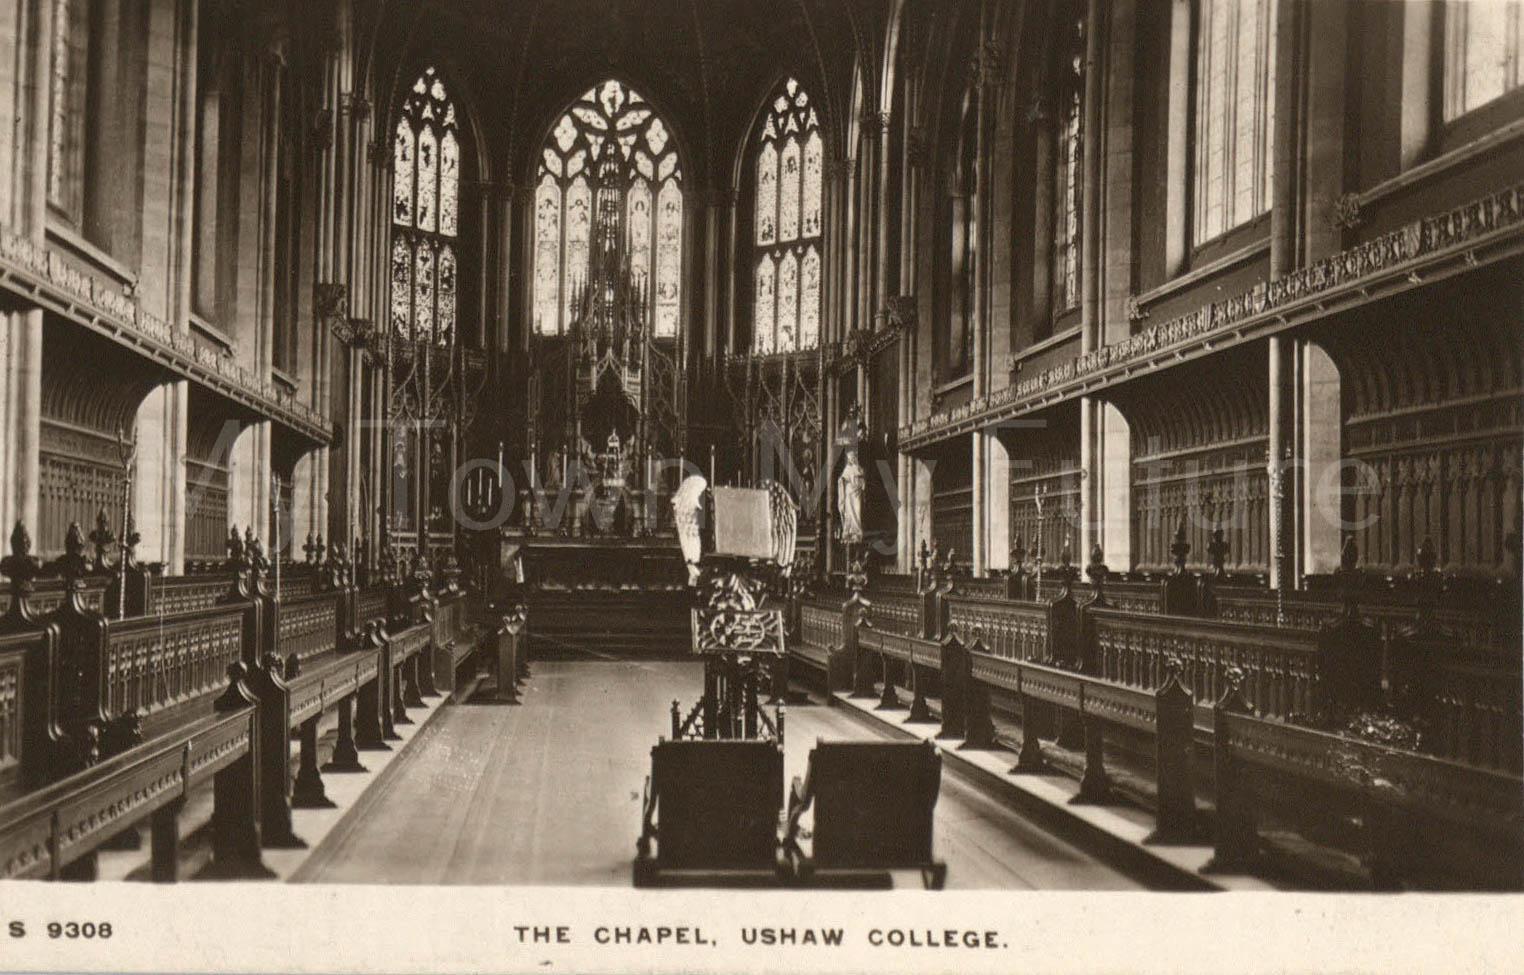 Urshaw College